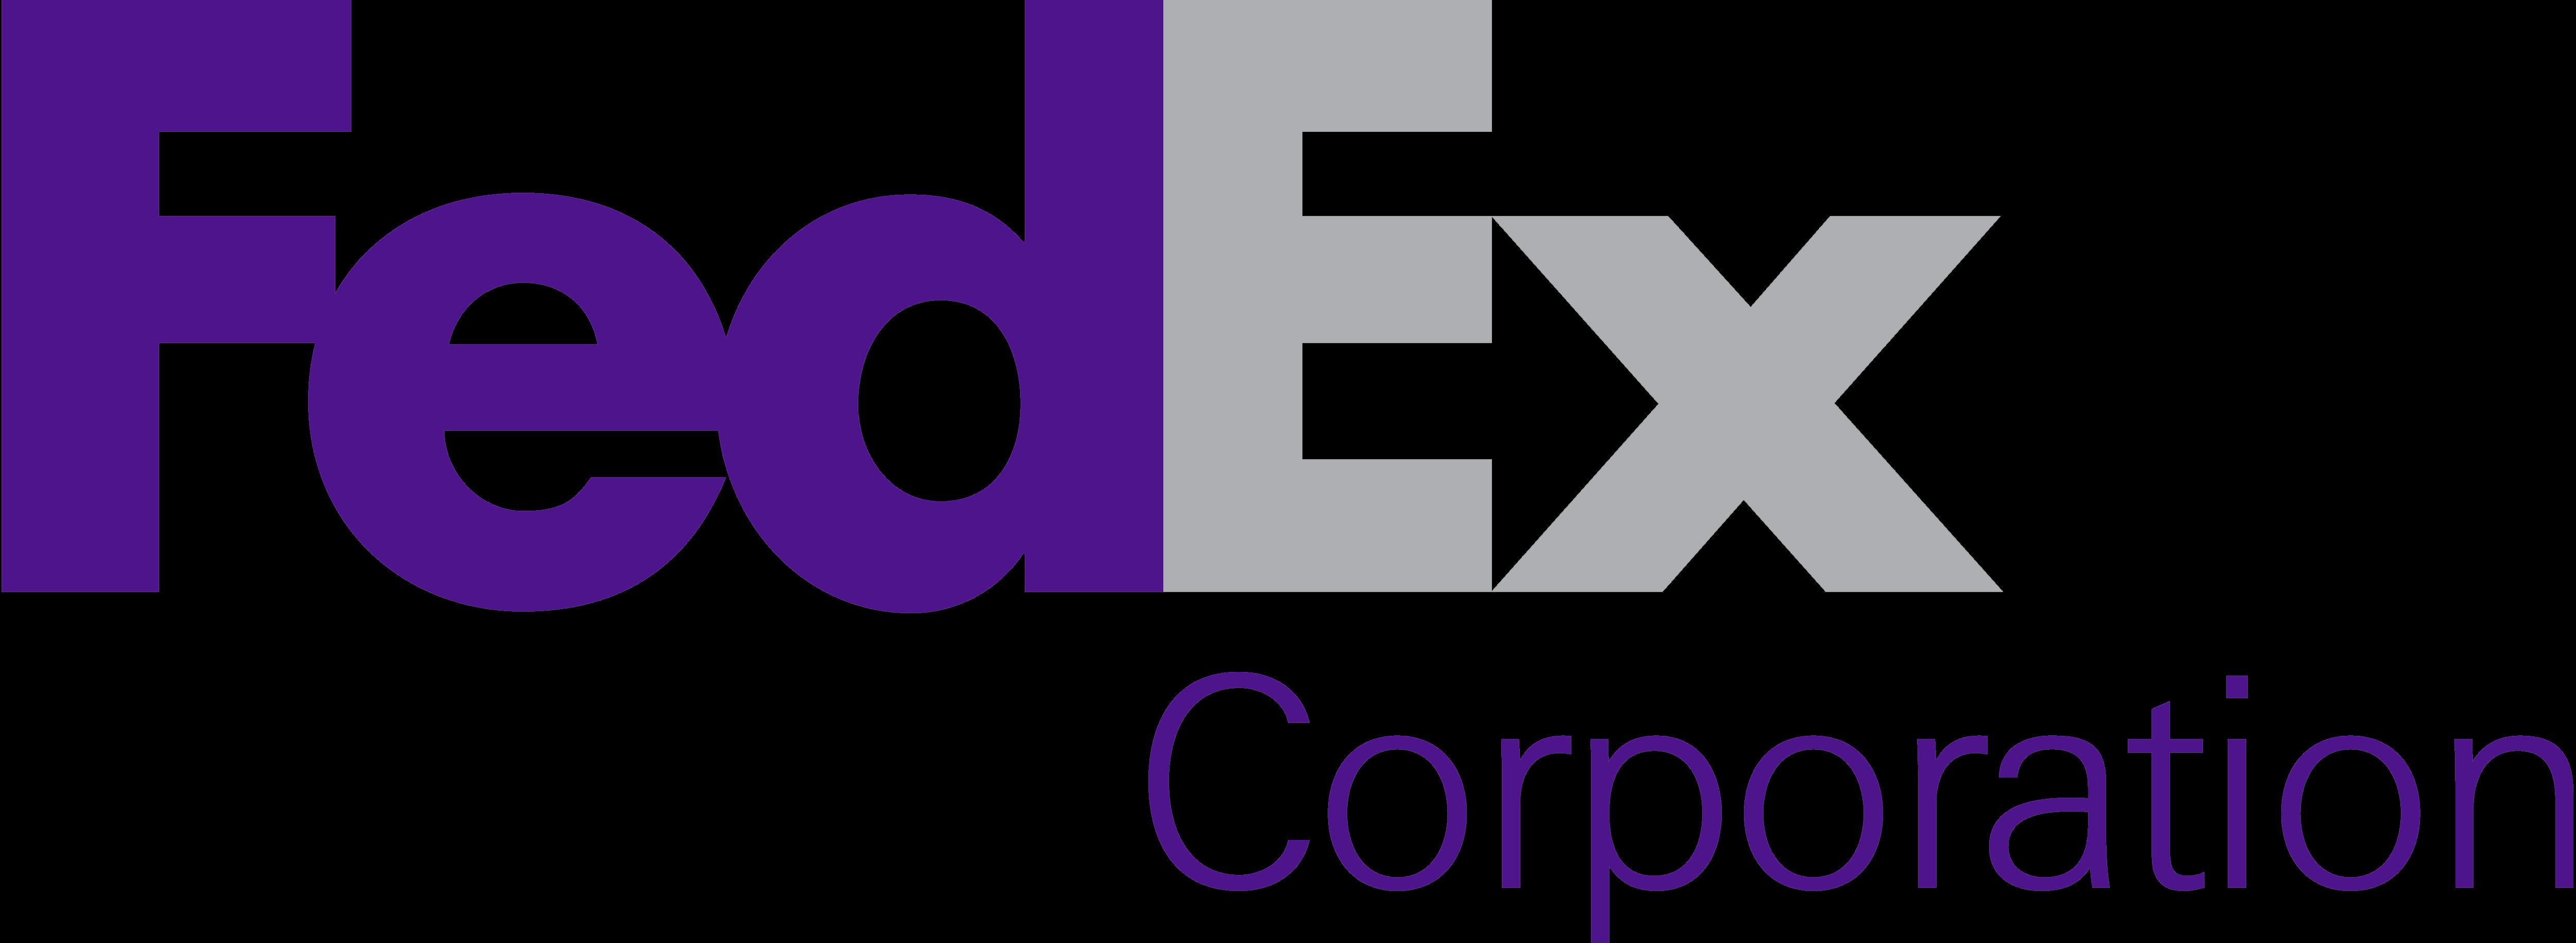 Fedex PNG - 39399